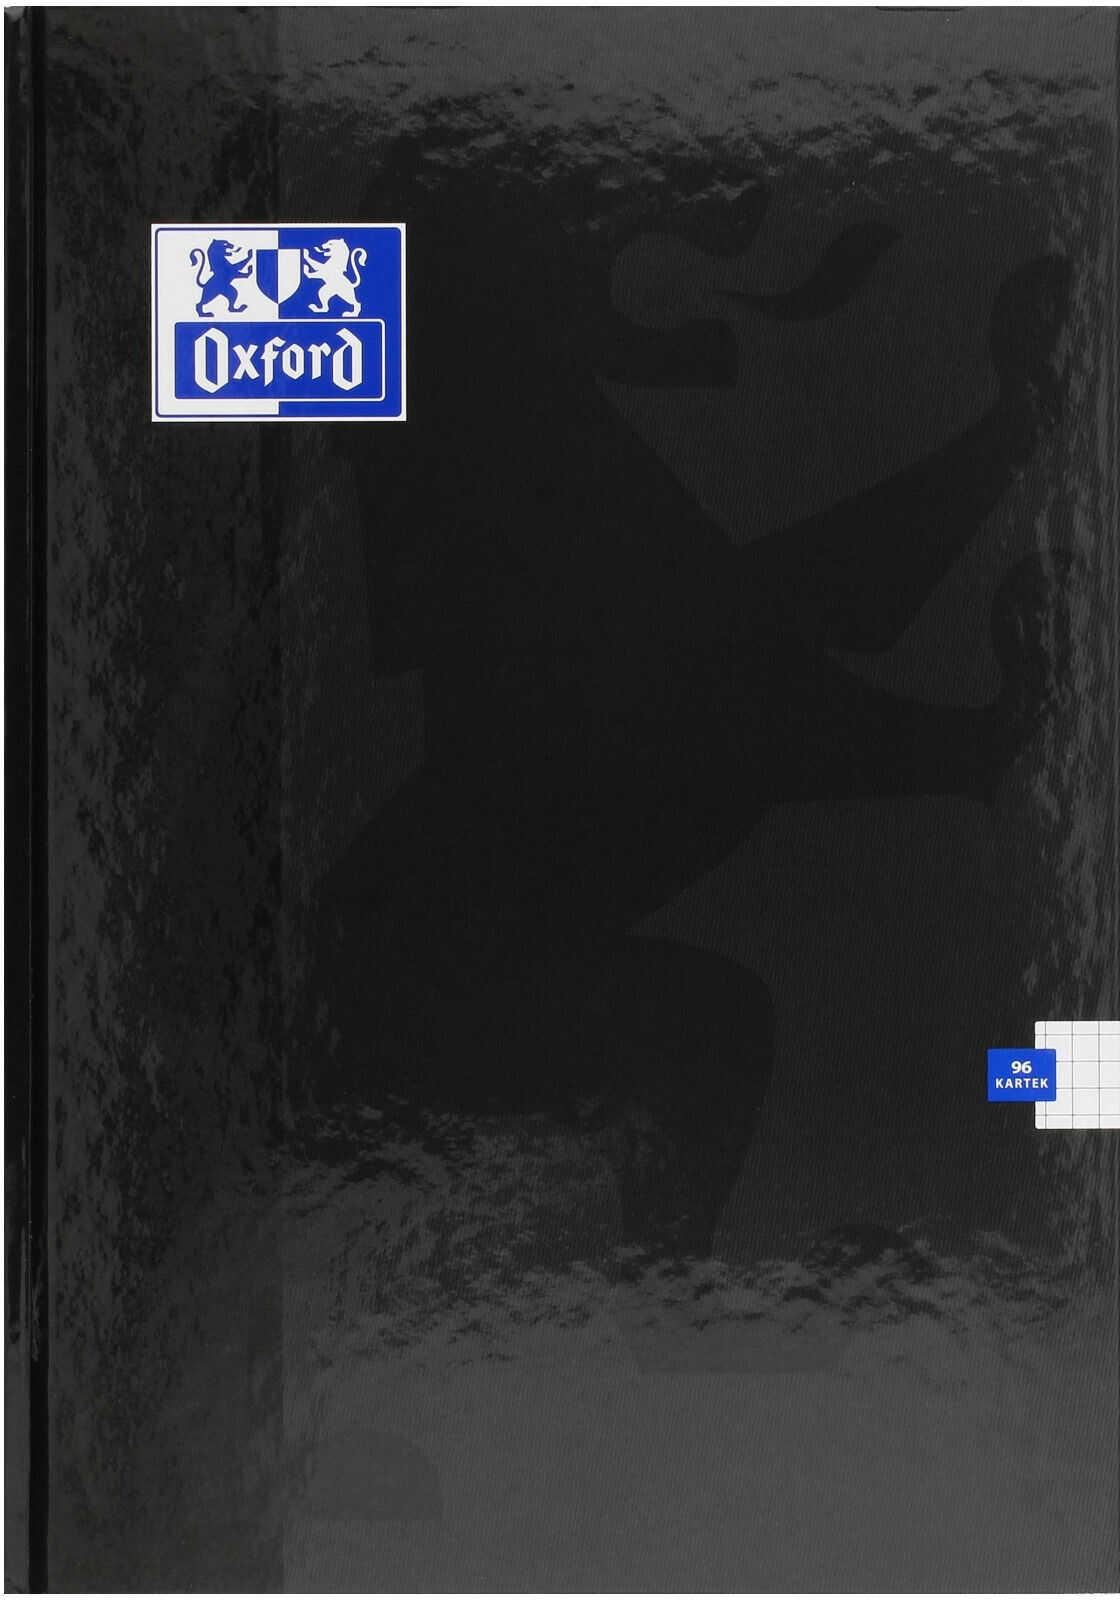 Brulion A4/96 kratka Esse Oxford czarny 400136903